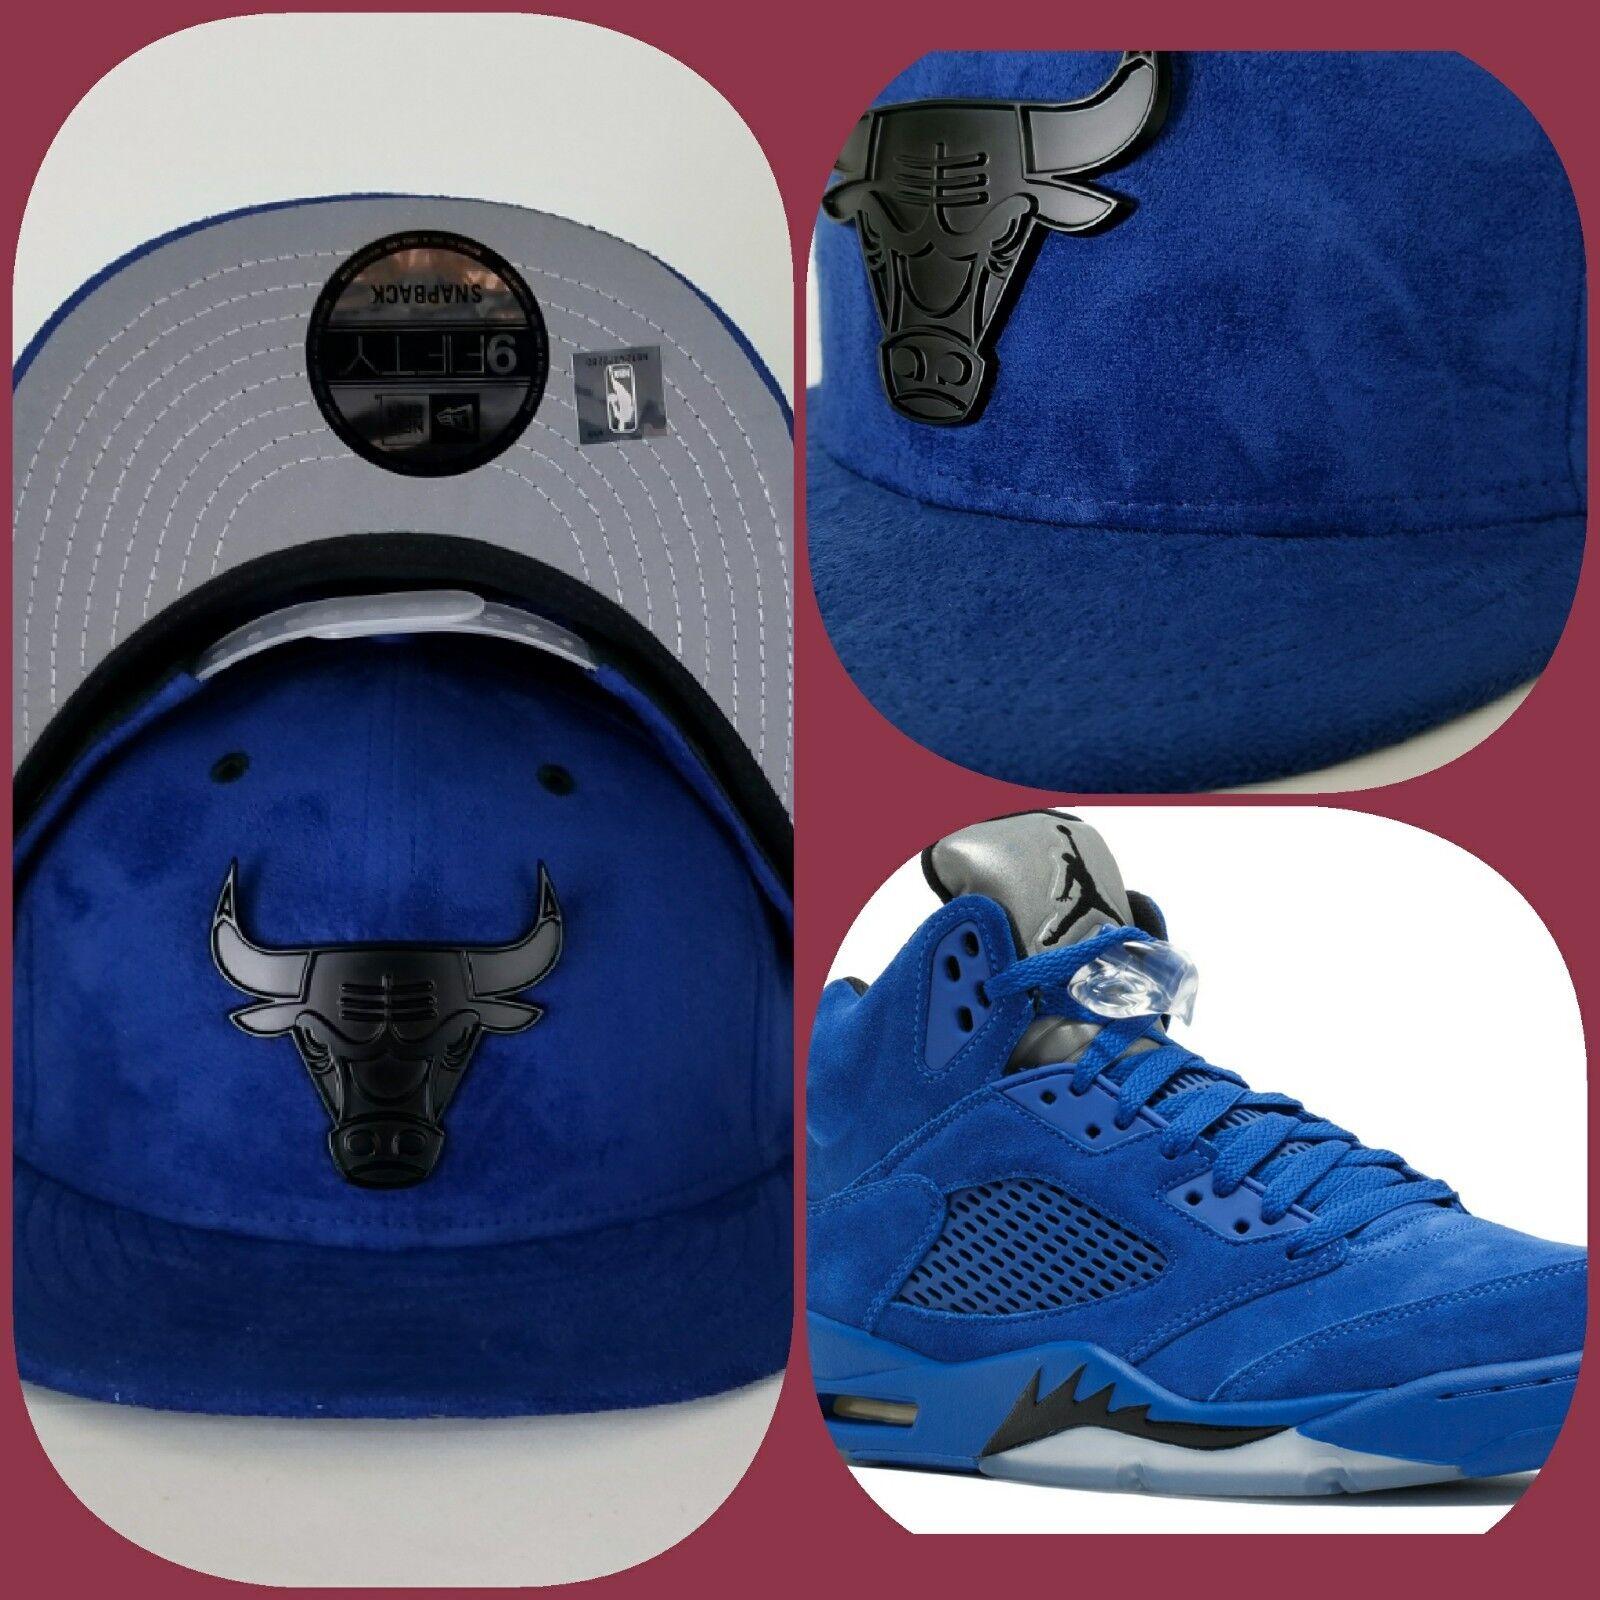 Details about New Era Suede Chicago Bulls Black Metal snapback hat Jordan 5  Royal Blue Suede 27d86847eb9